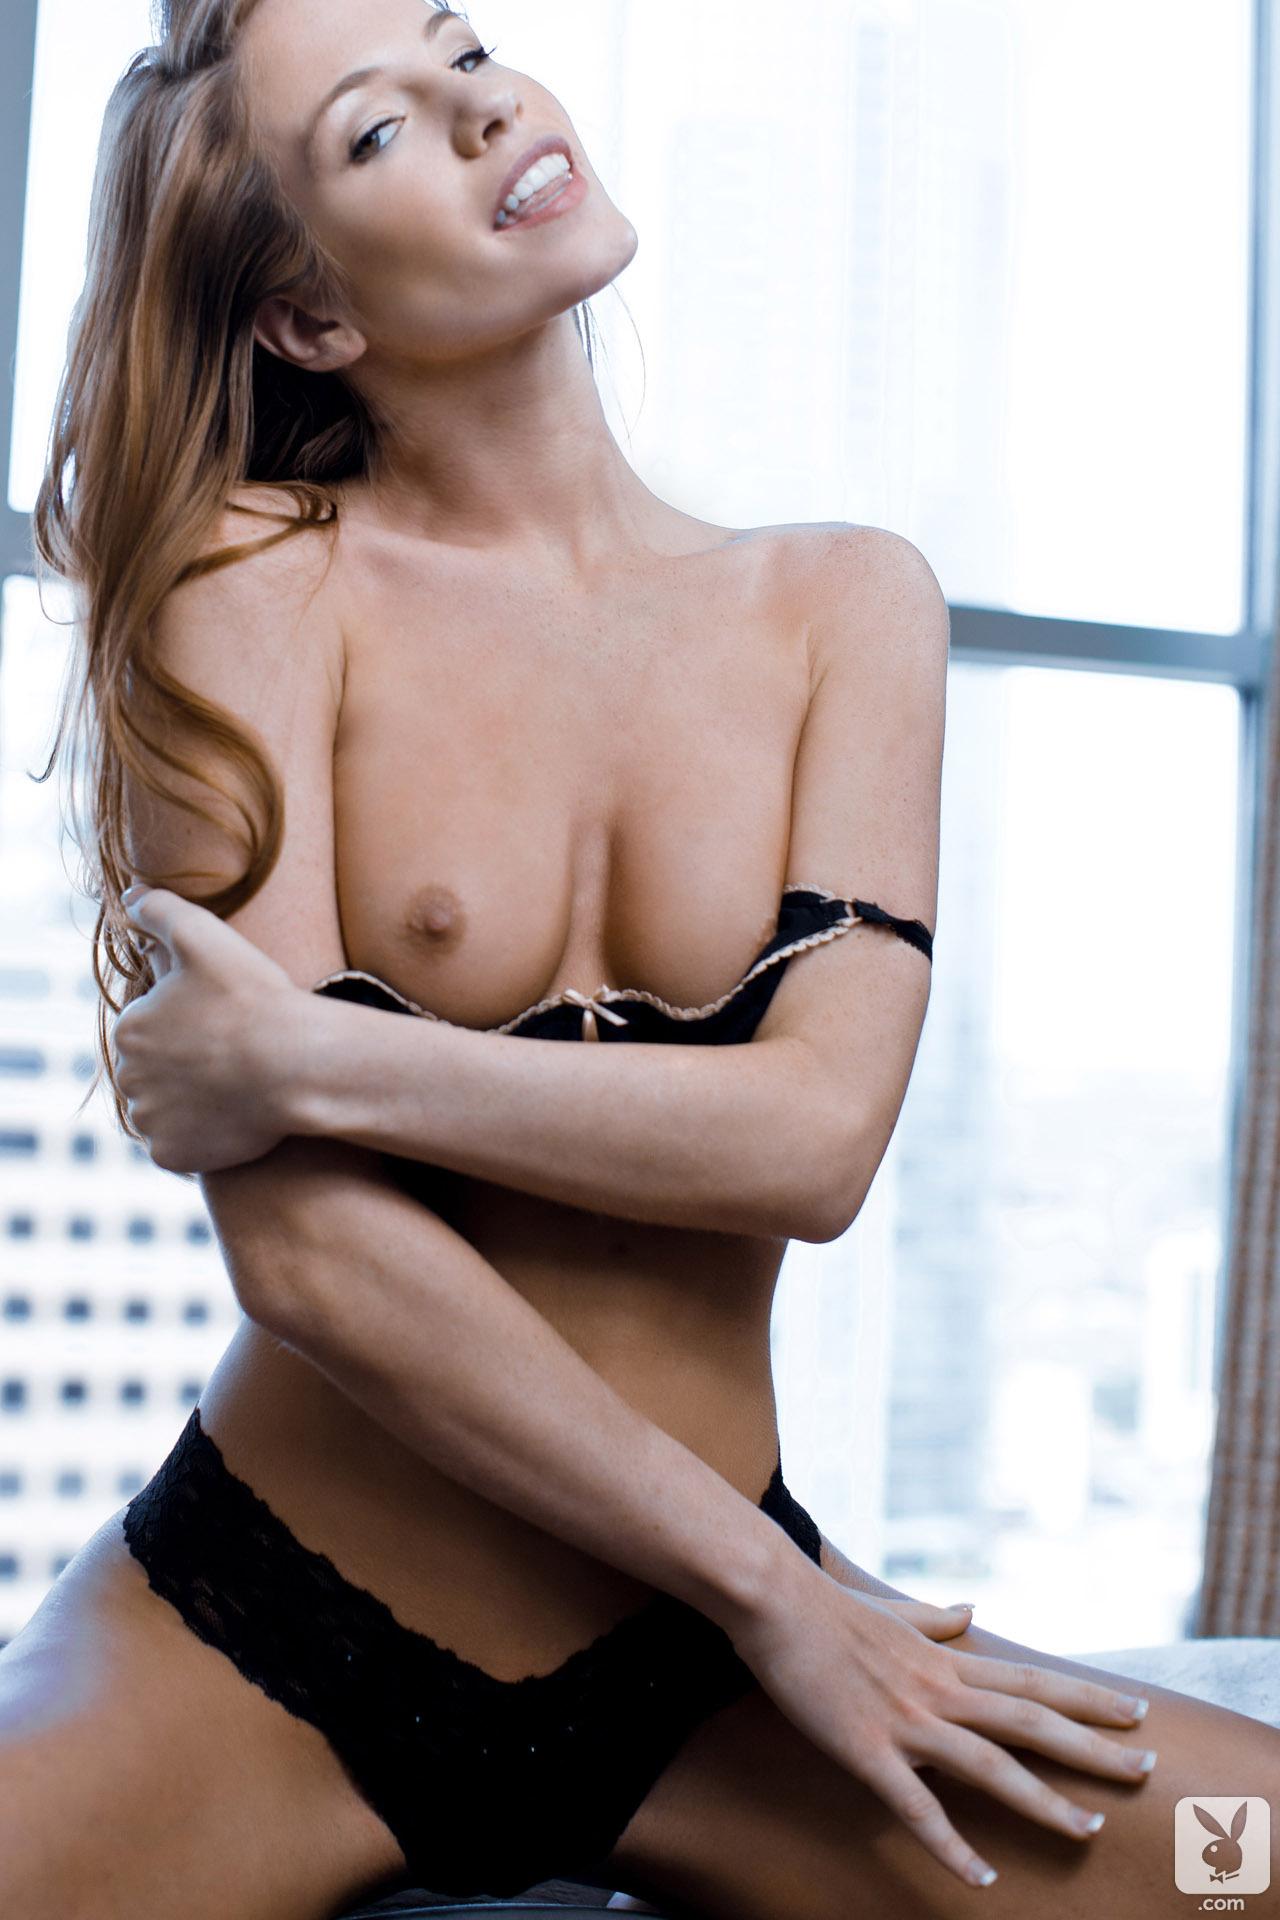 bree-morgan-nude-apartment-redhead-playboy-03